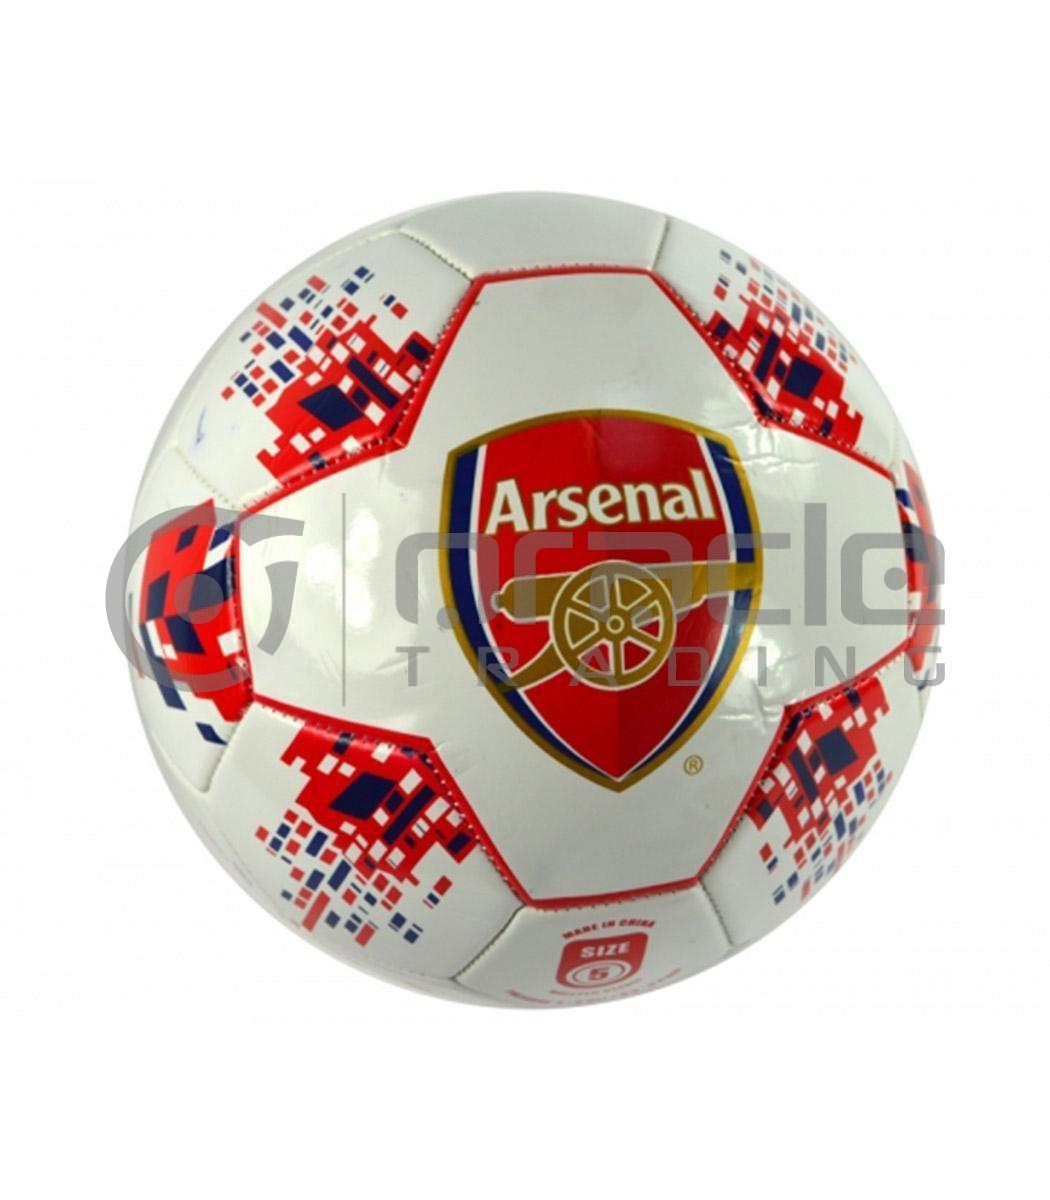 Arsenal Large Soccer Ball